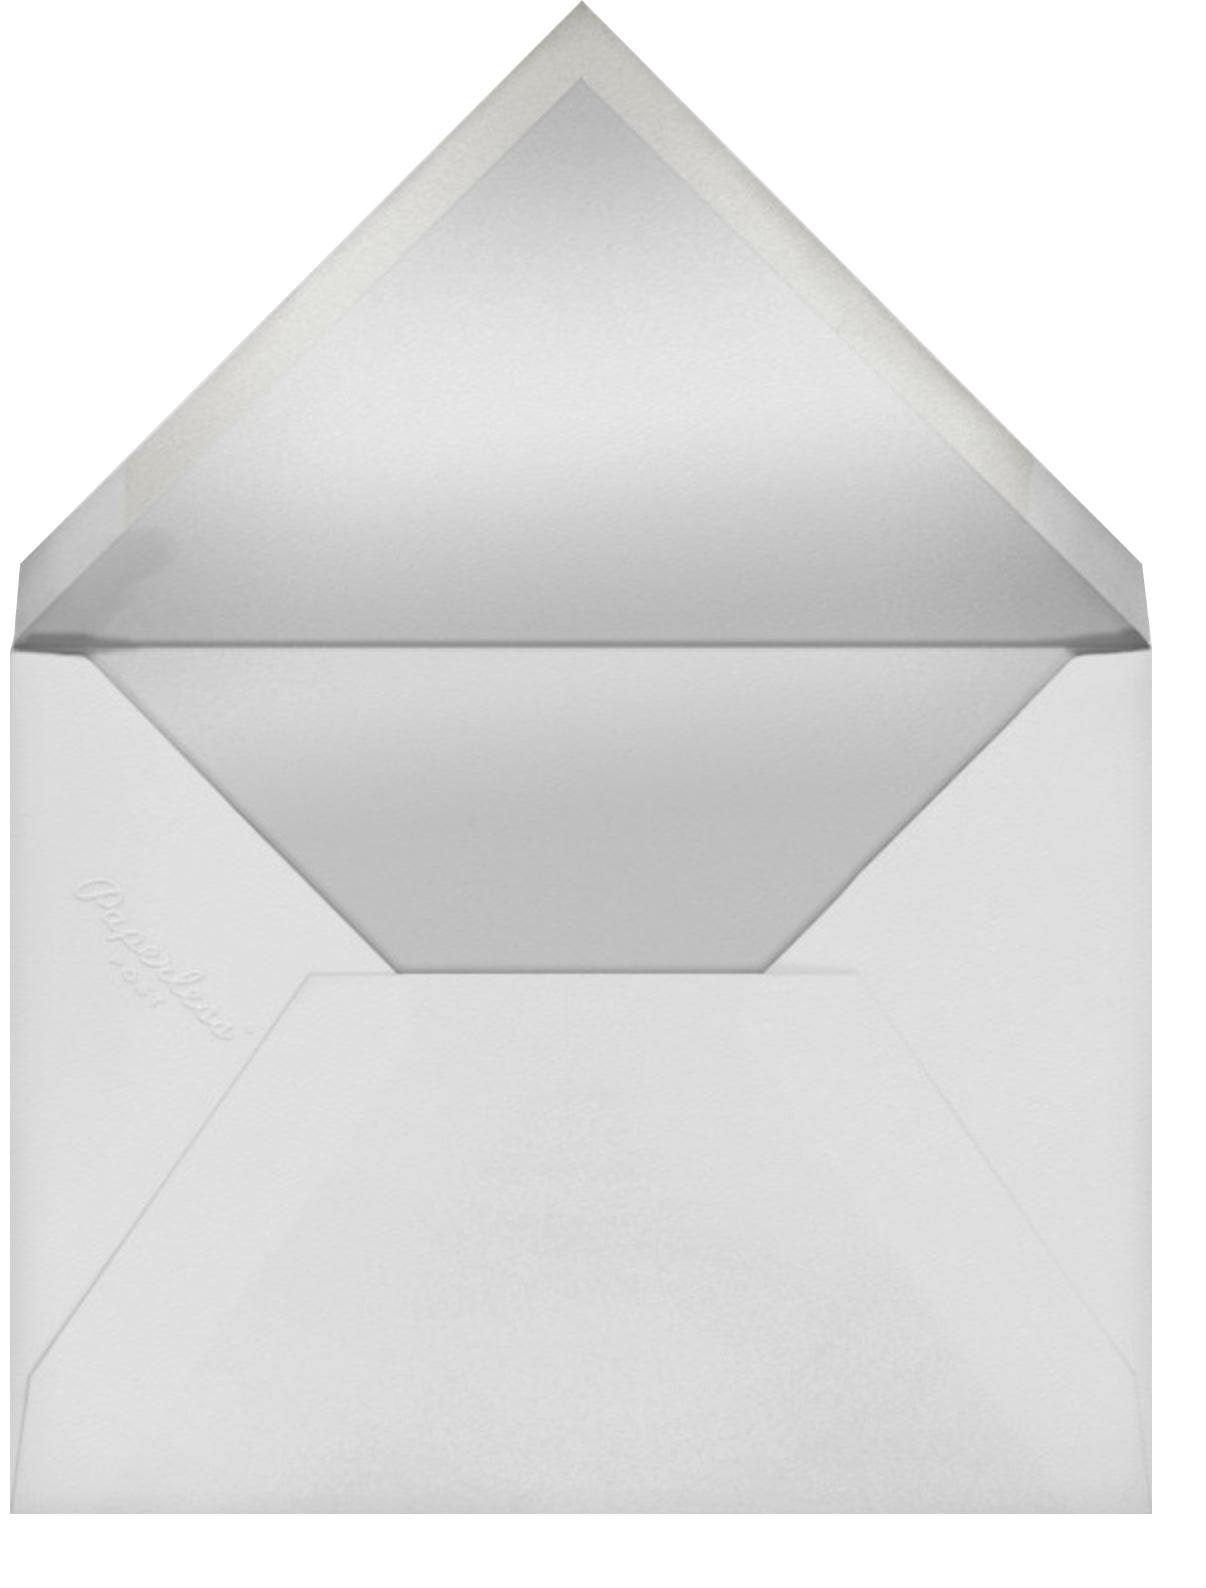 Rattan - Lemon Drop - Paperless Post - Baby shower - envelope back